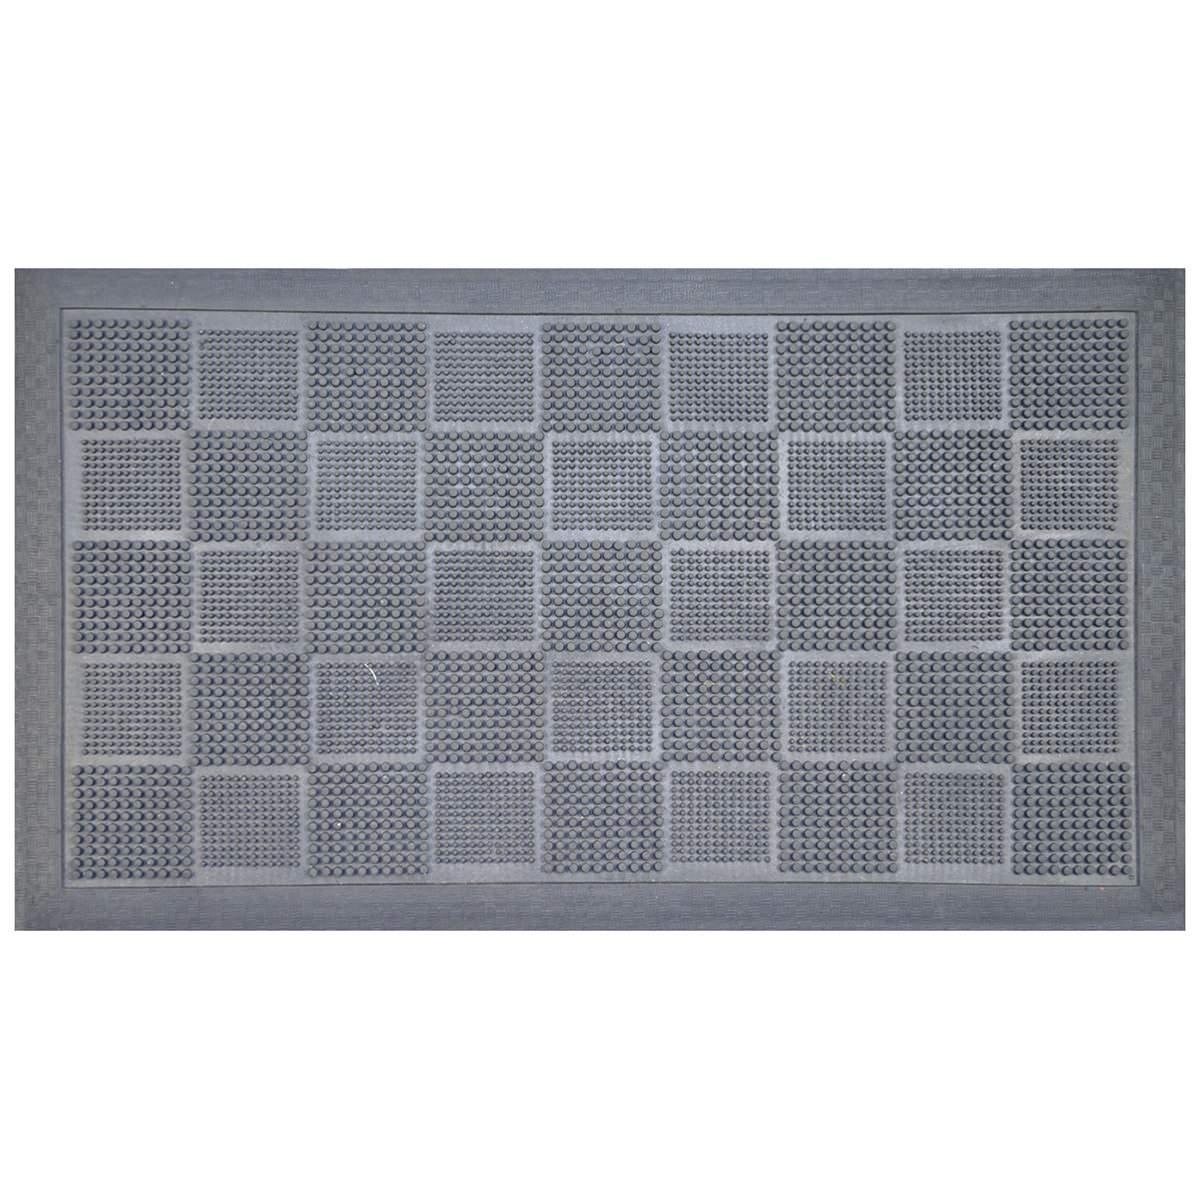 Pin Stripe Rubber Doormat, 70x40cm